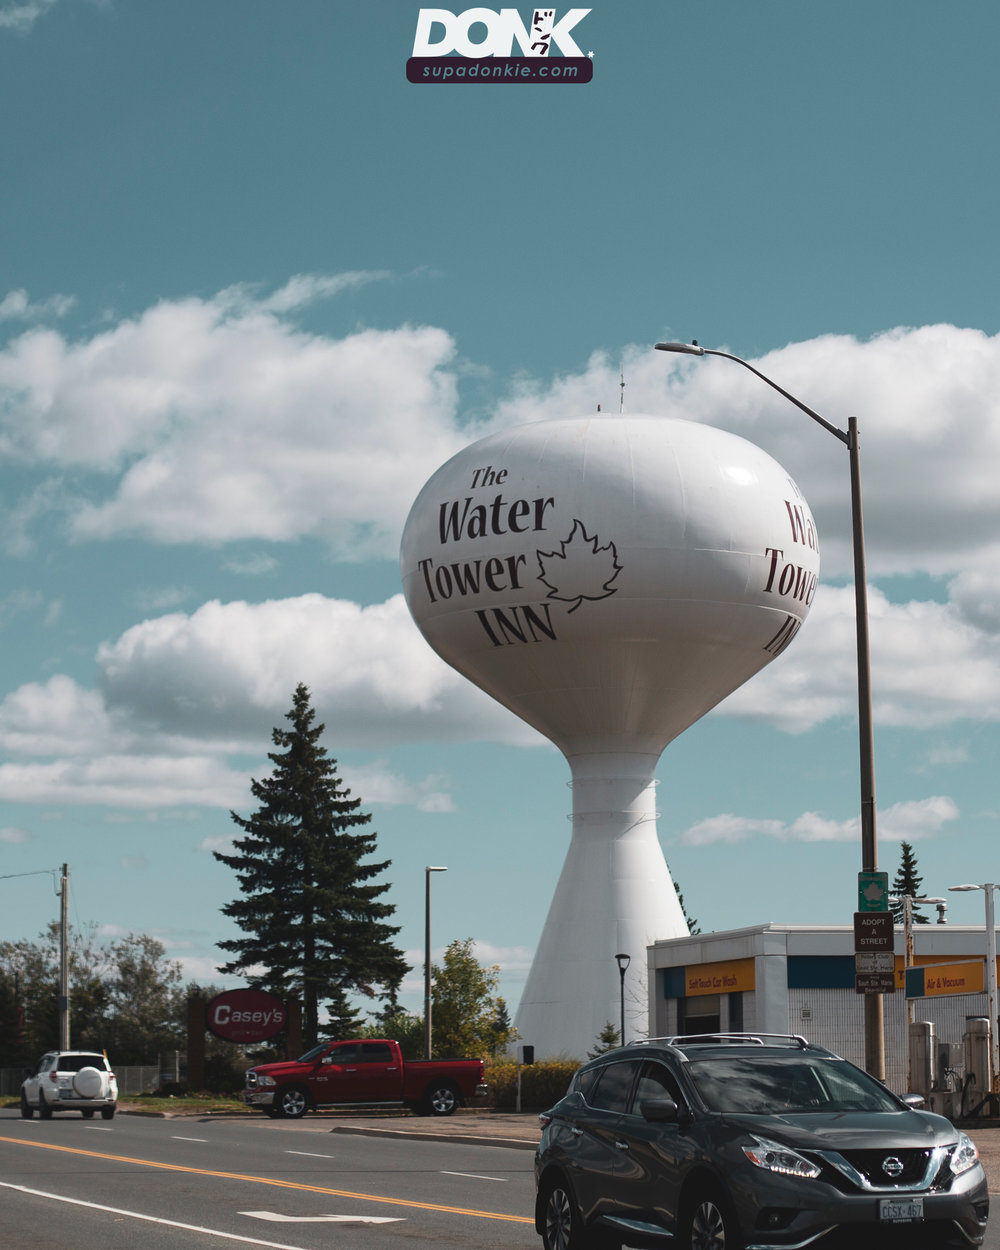 The Water Tower Inn @ Sault Ste. Marie